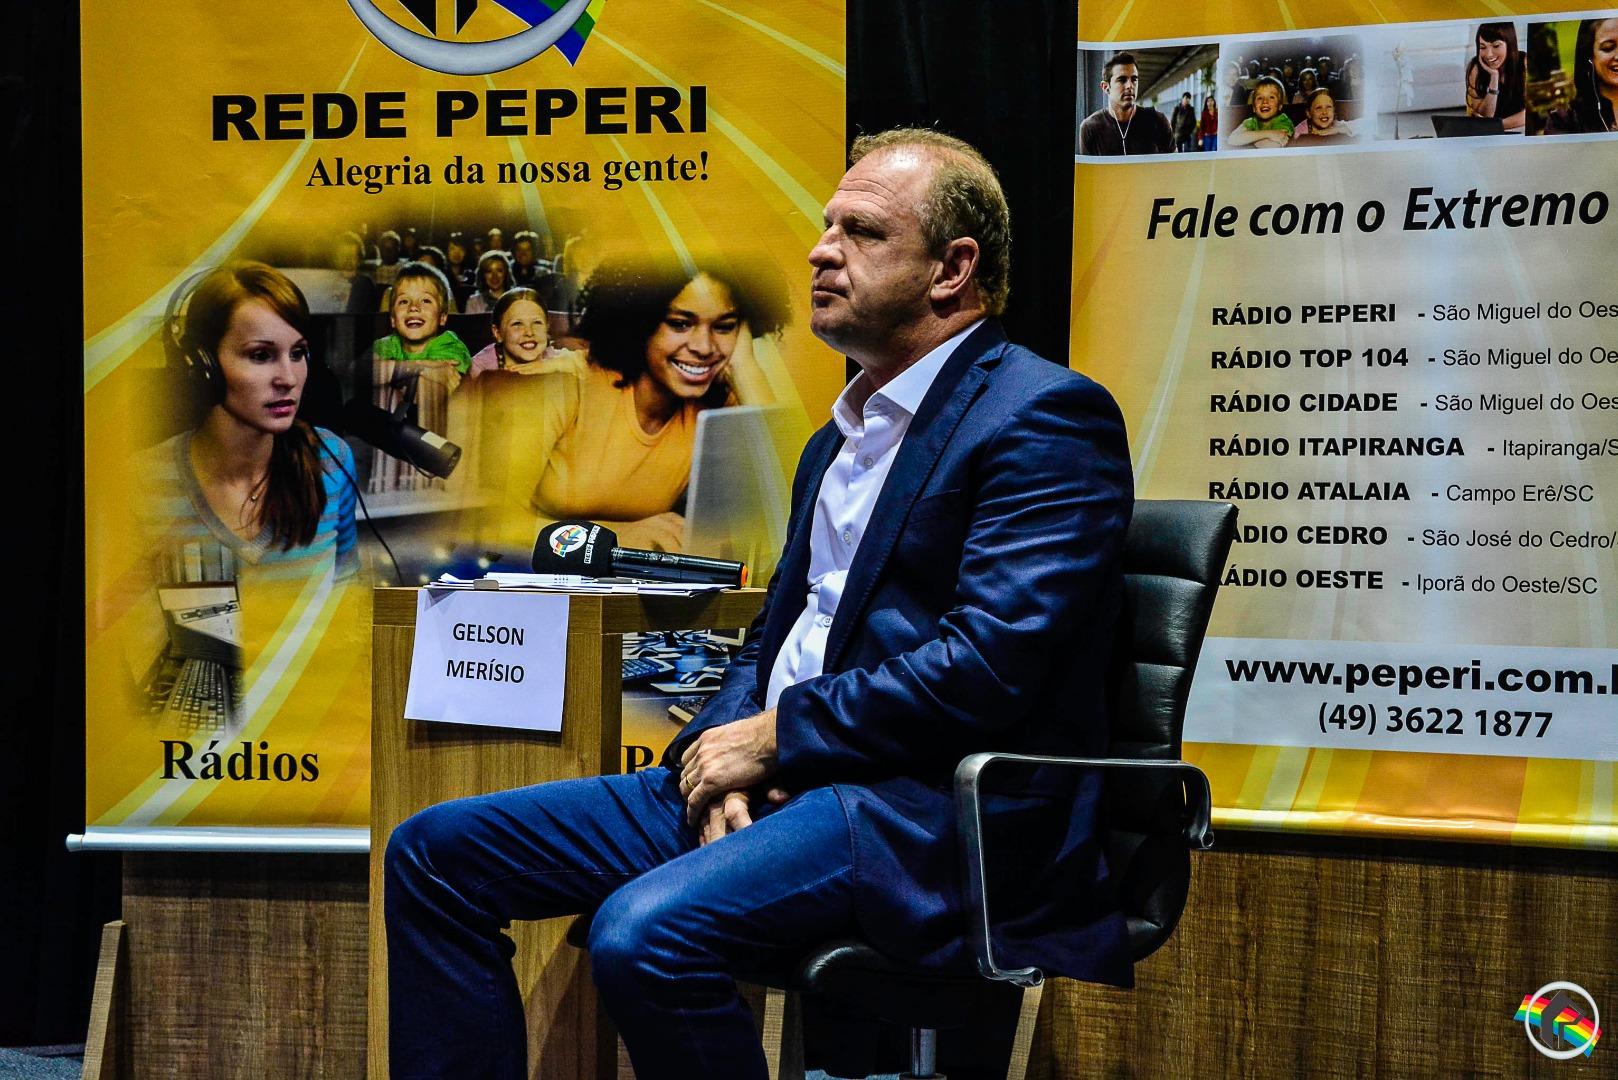 AO VIVO: Merisio e Comandante Moisés debatem na Peperi